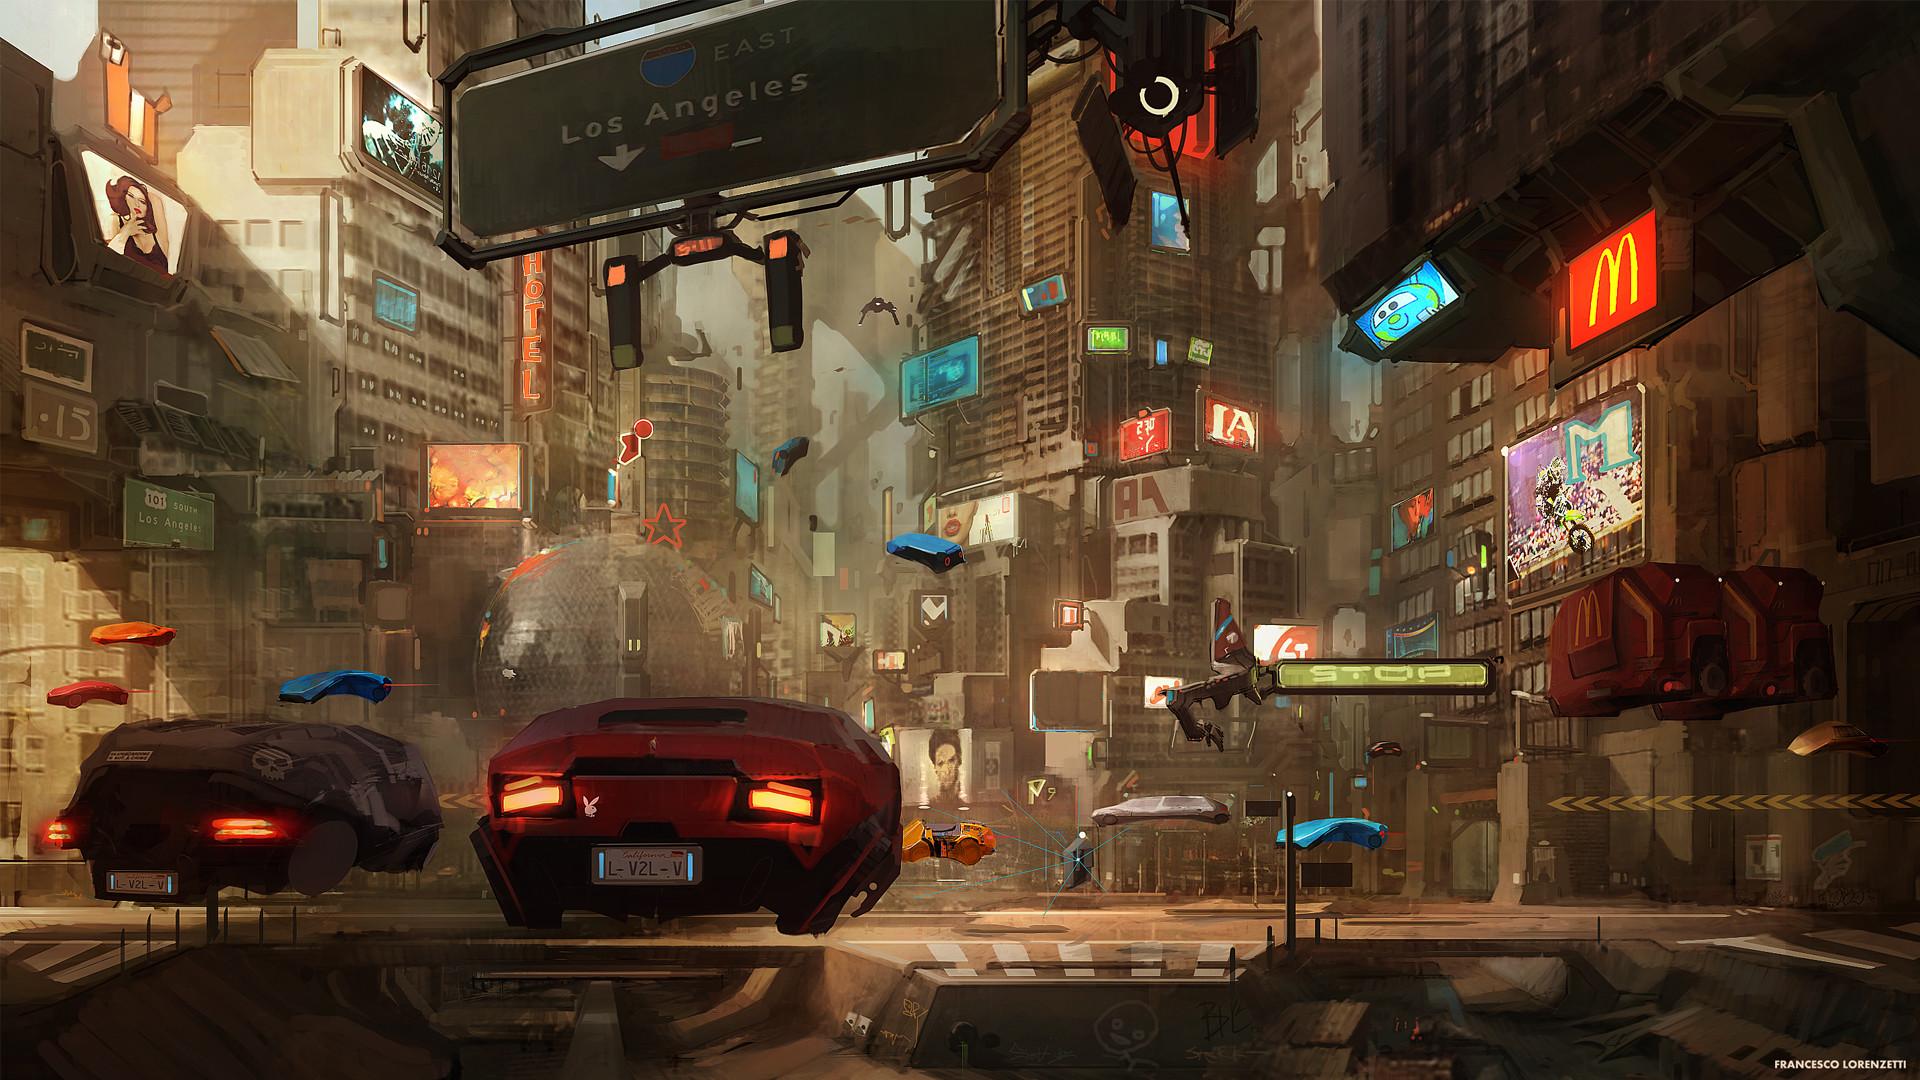 artwork, Fantasy Art, Anime, Cyborg, Futuristic, City